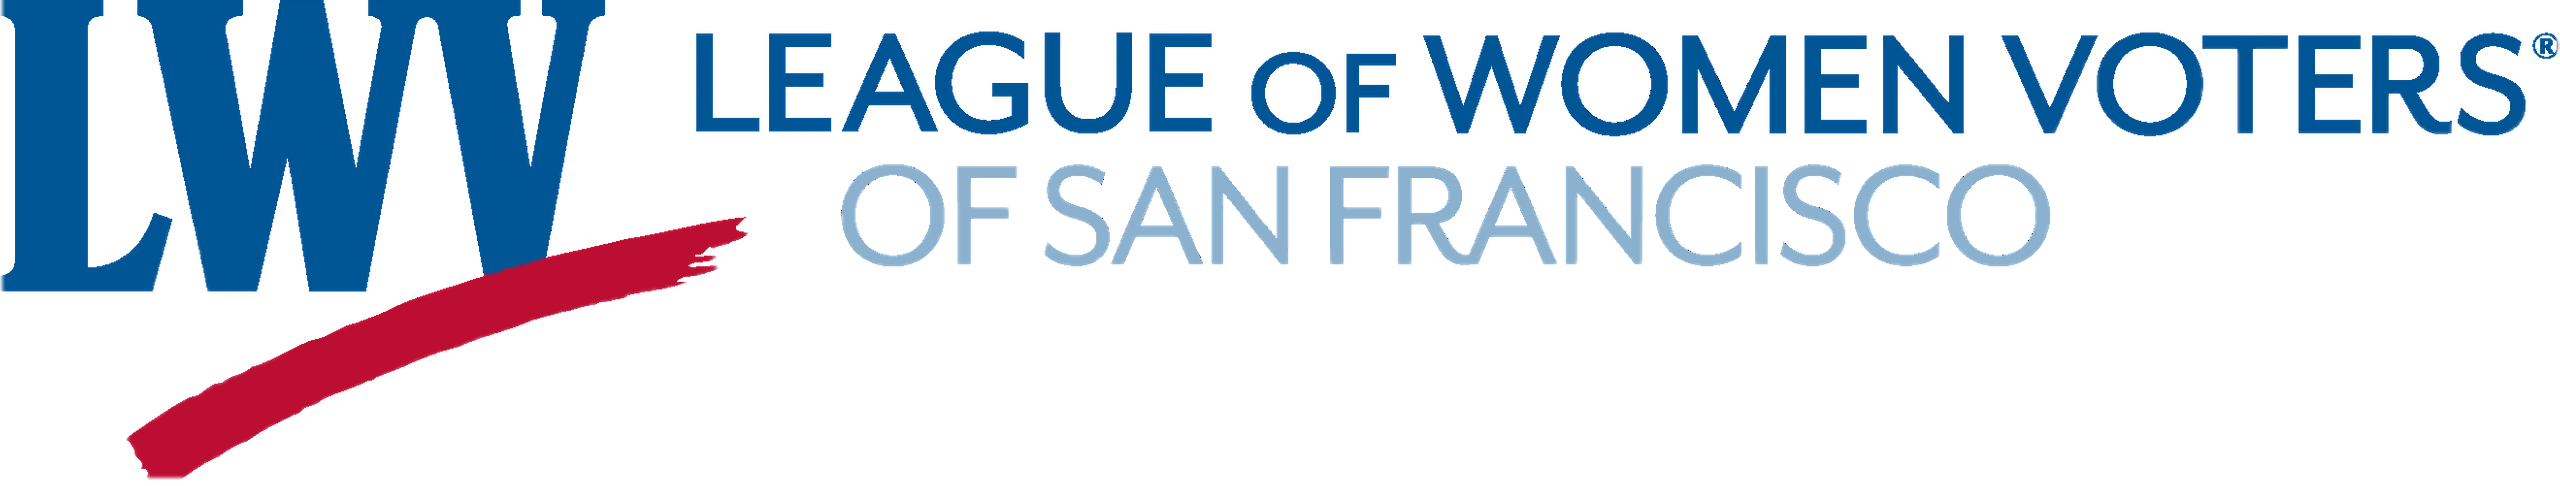 League of Women Voters of SF Logo